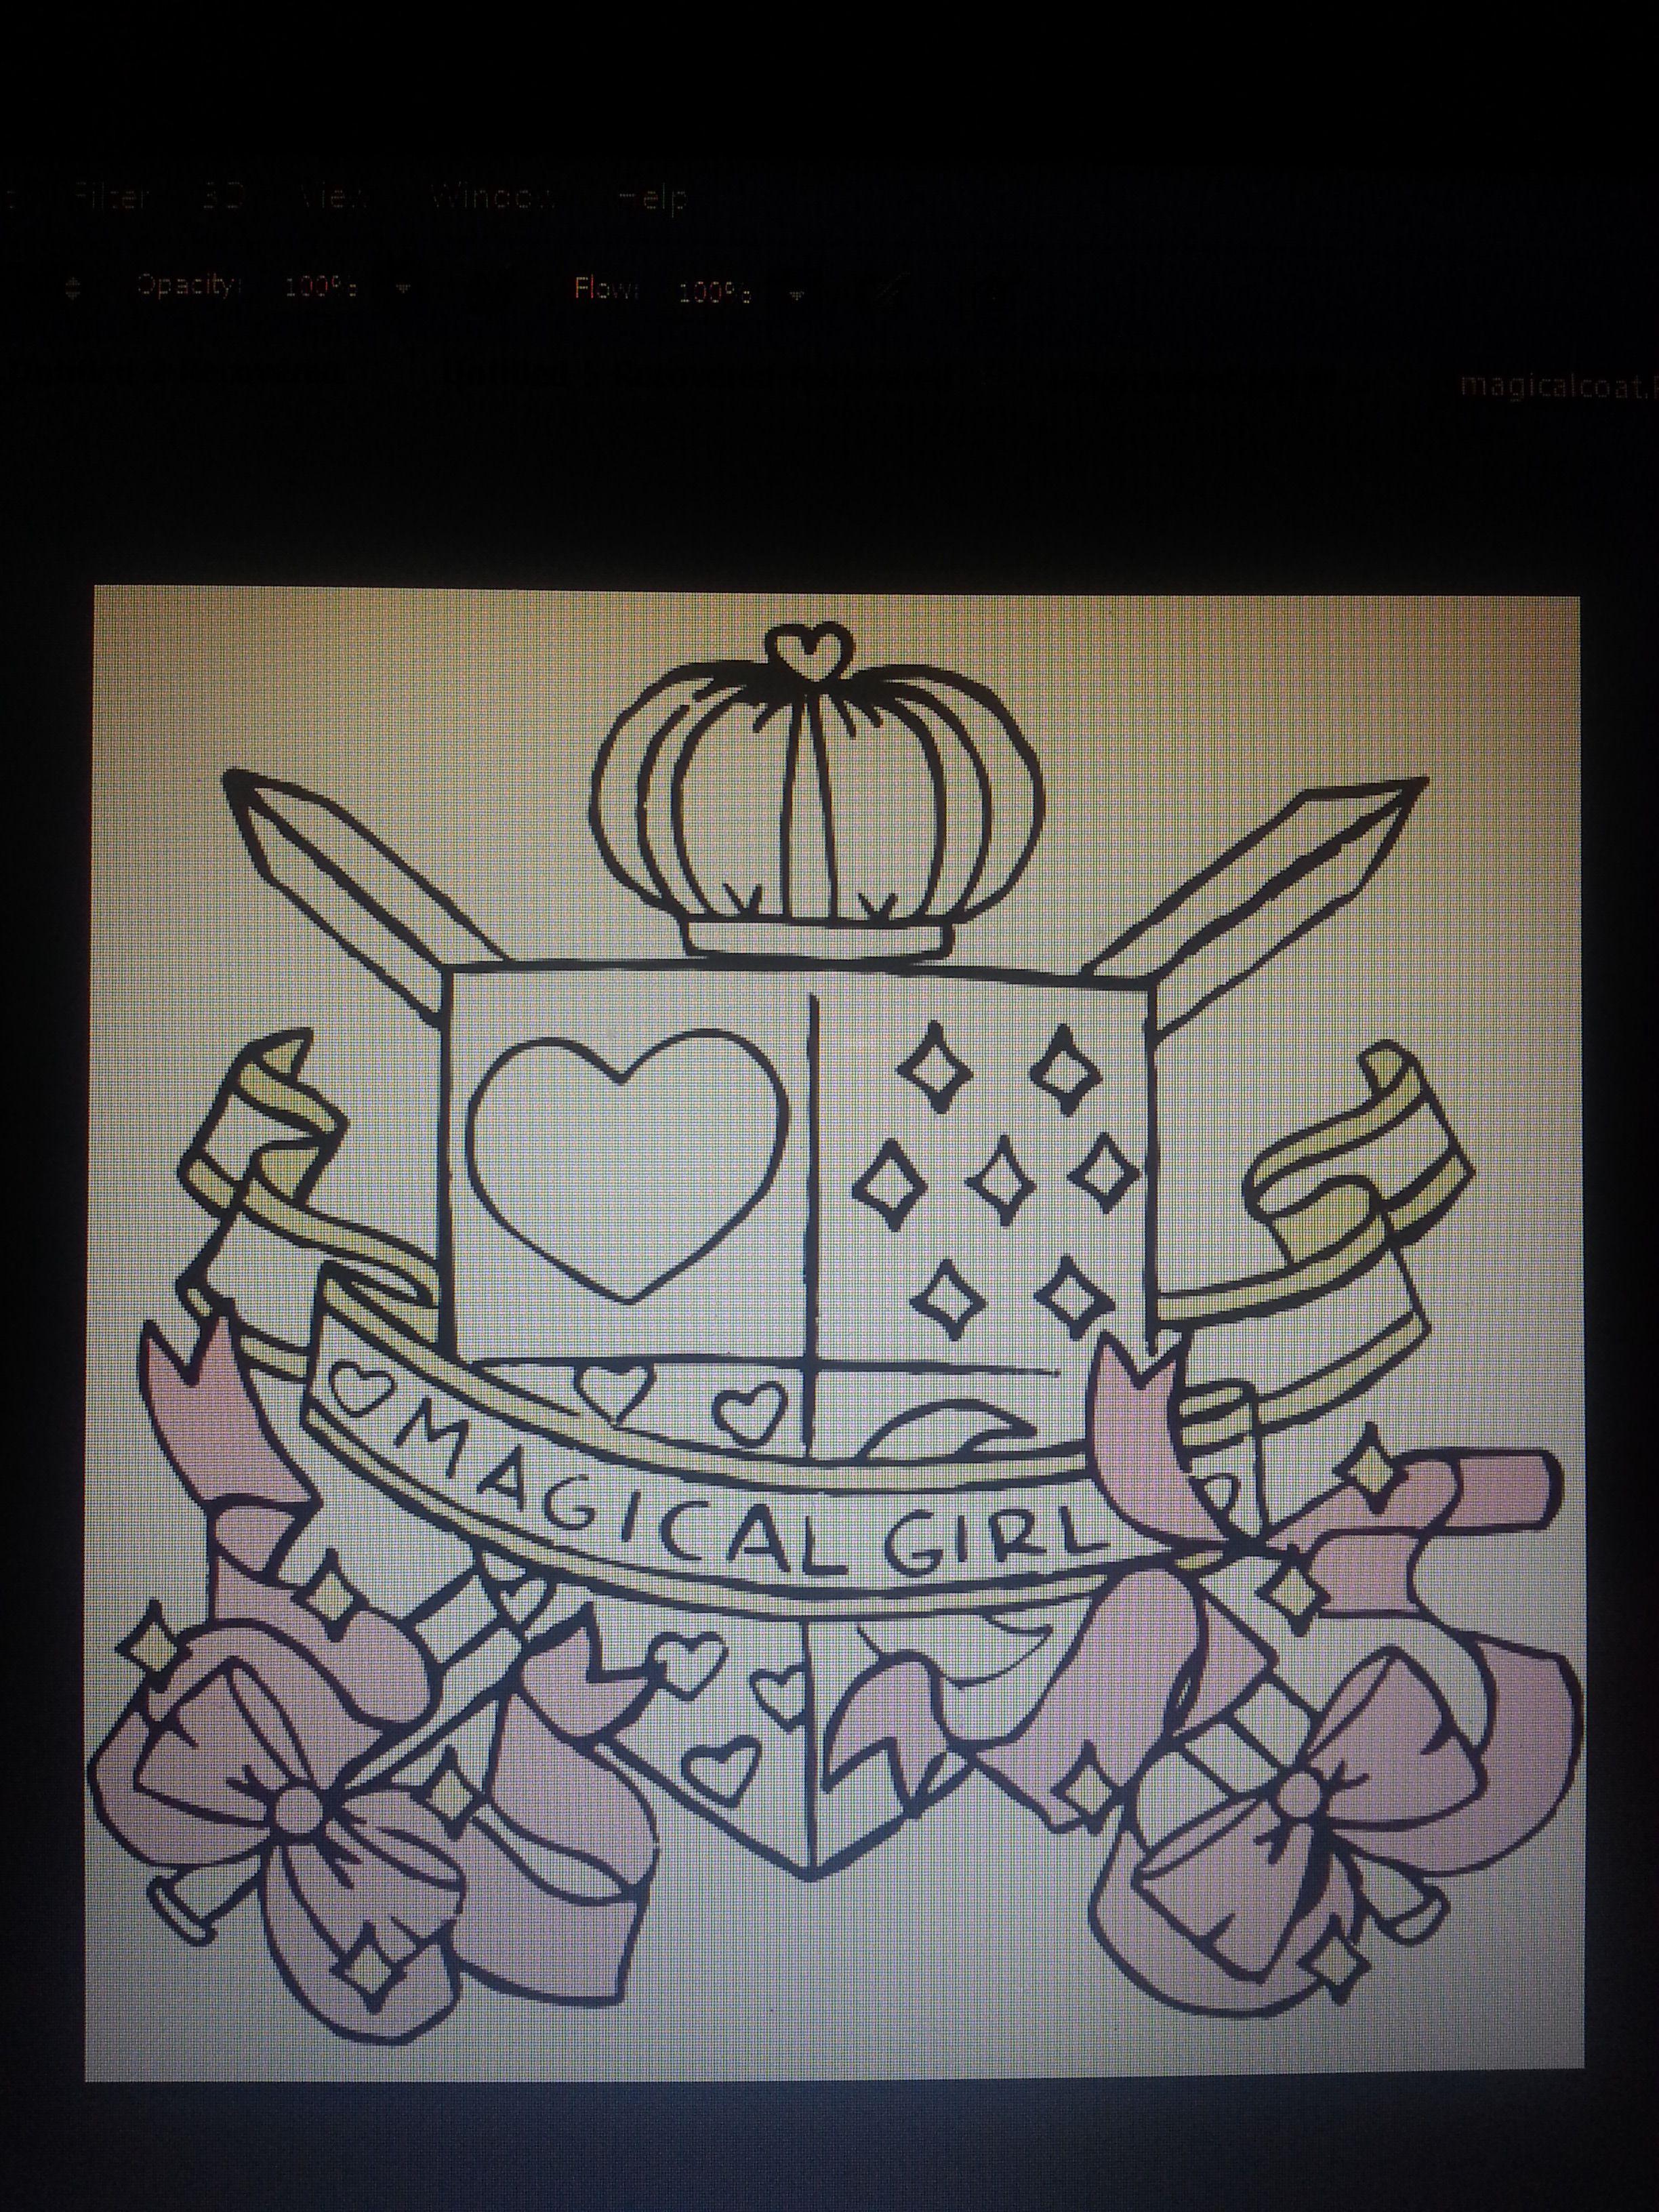 magical girl design - Google Search